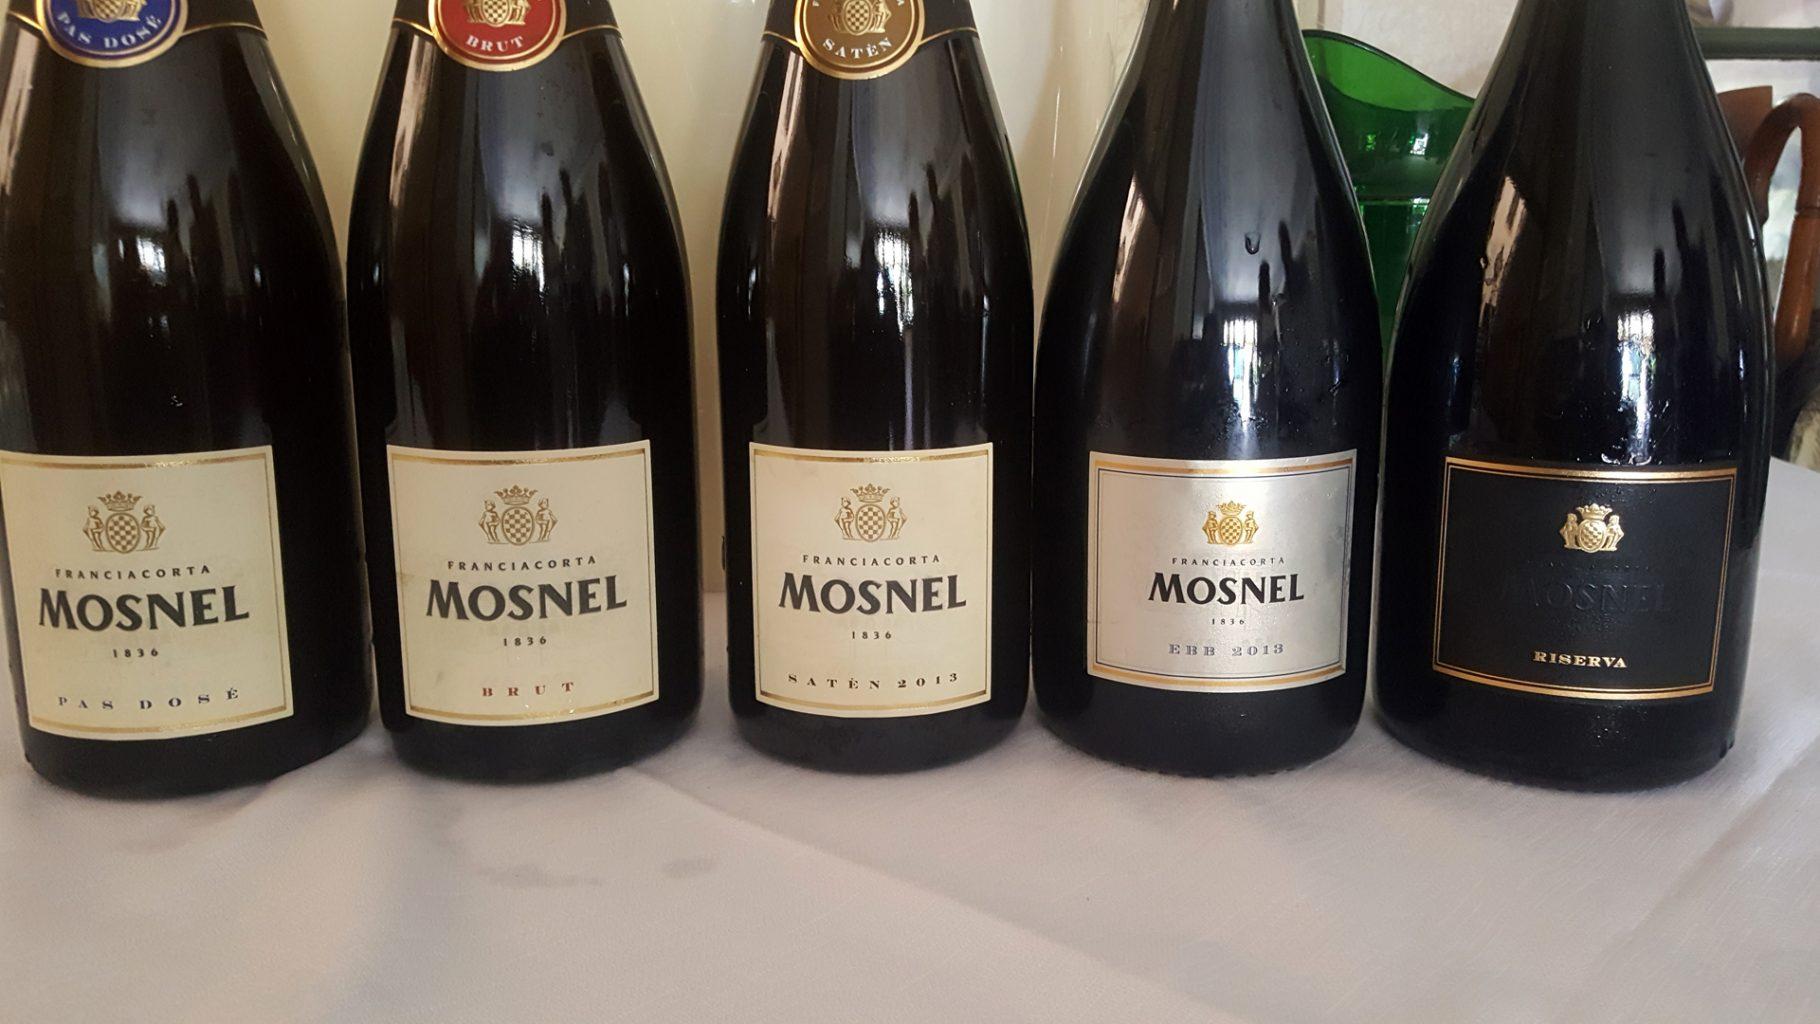 Franciacorta Mosnel